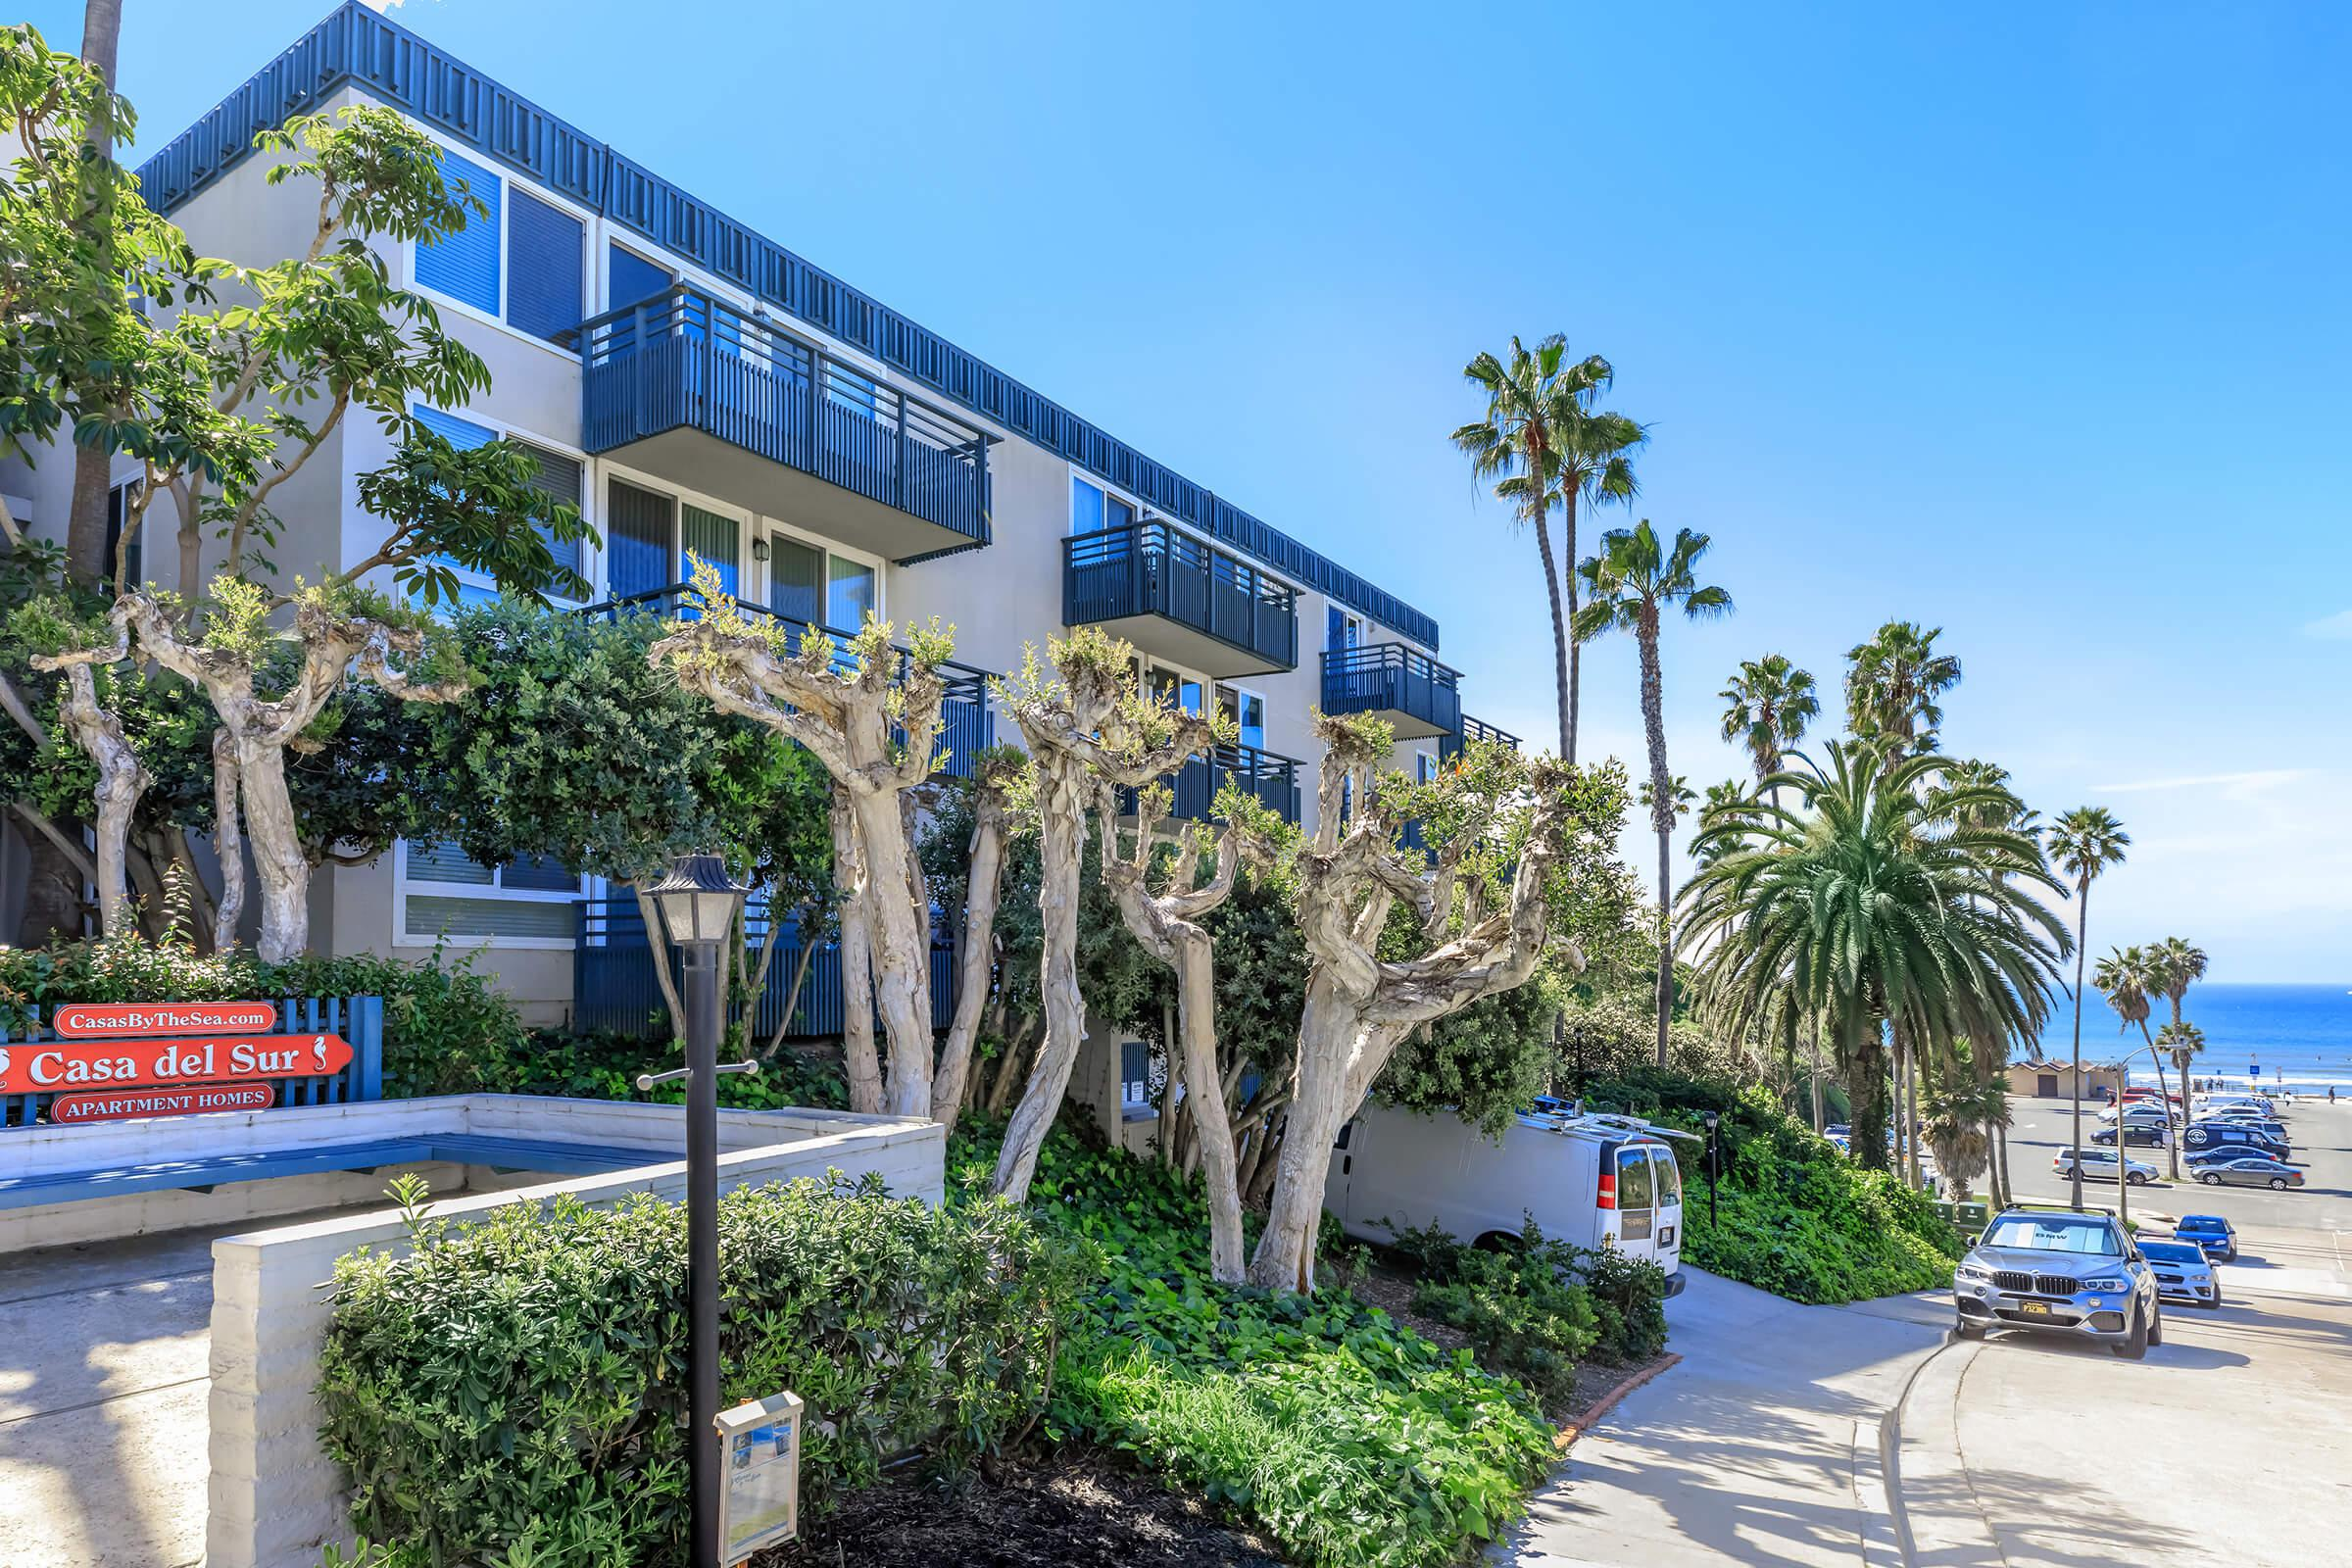 Walk to the beach at Casa Del Sur in San Diego, California